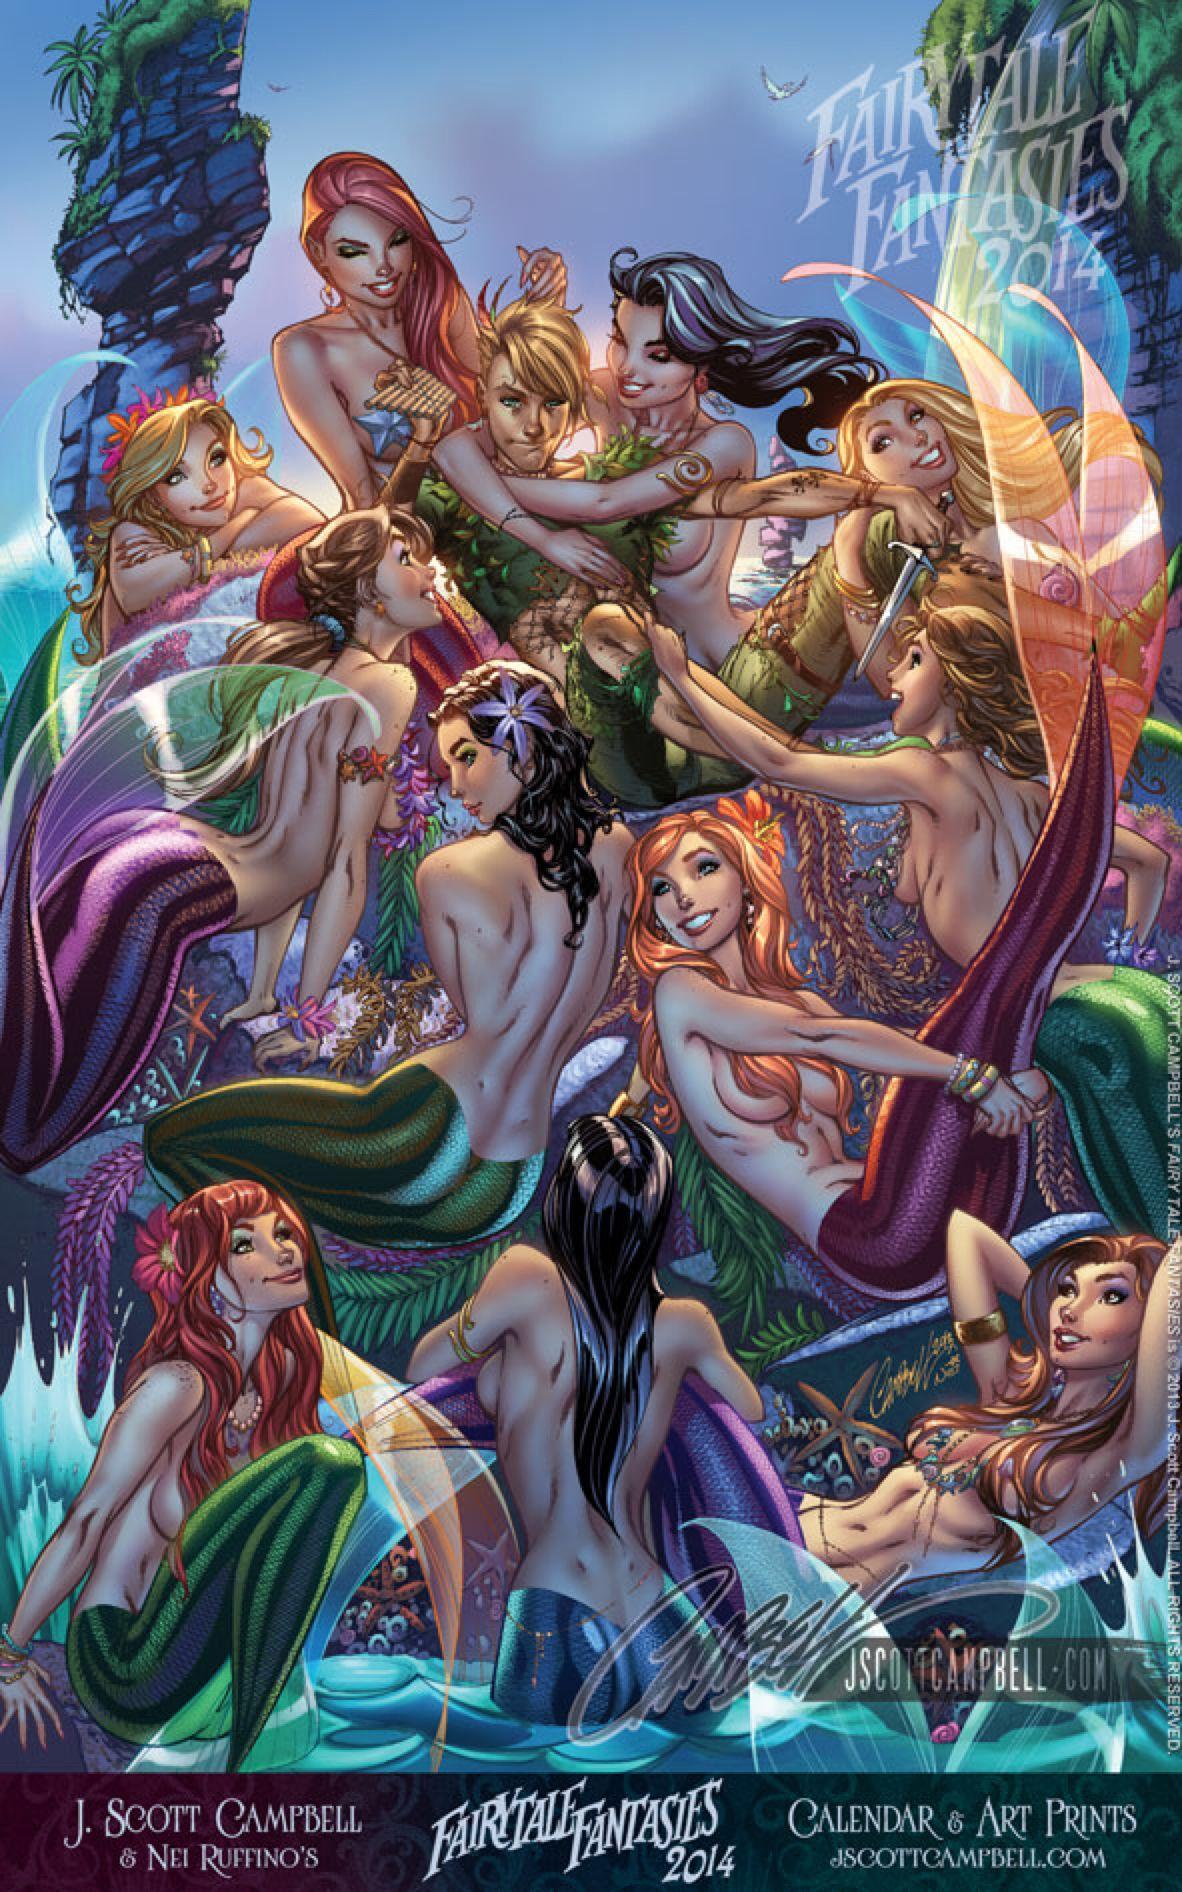 Fairies and elves xxx toons erotic film